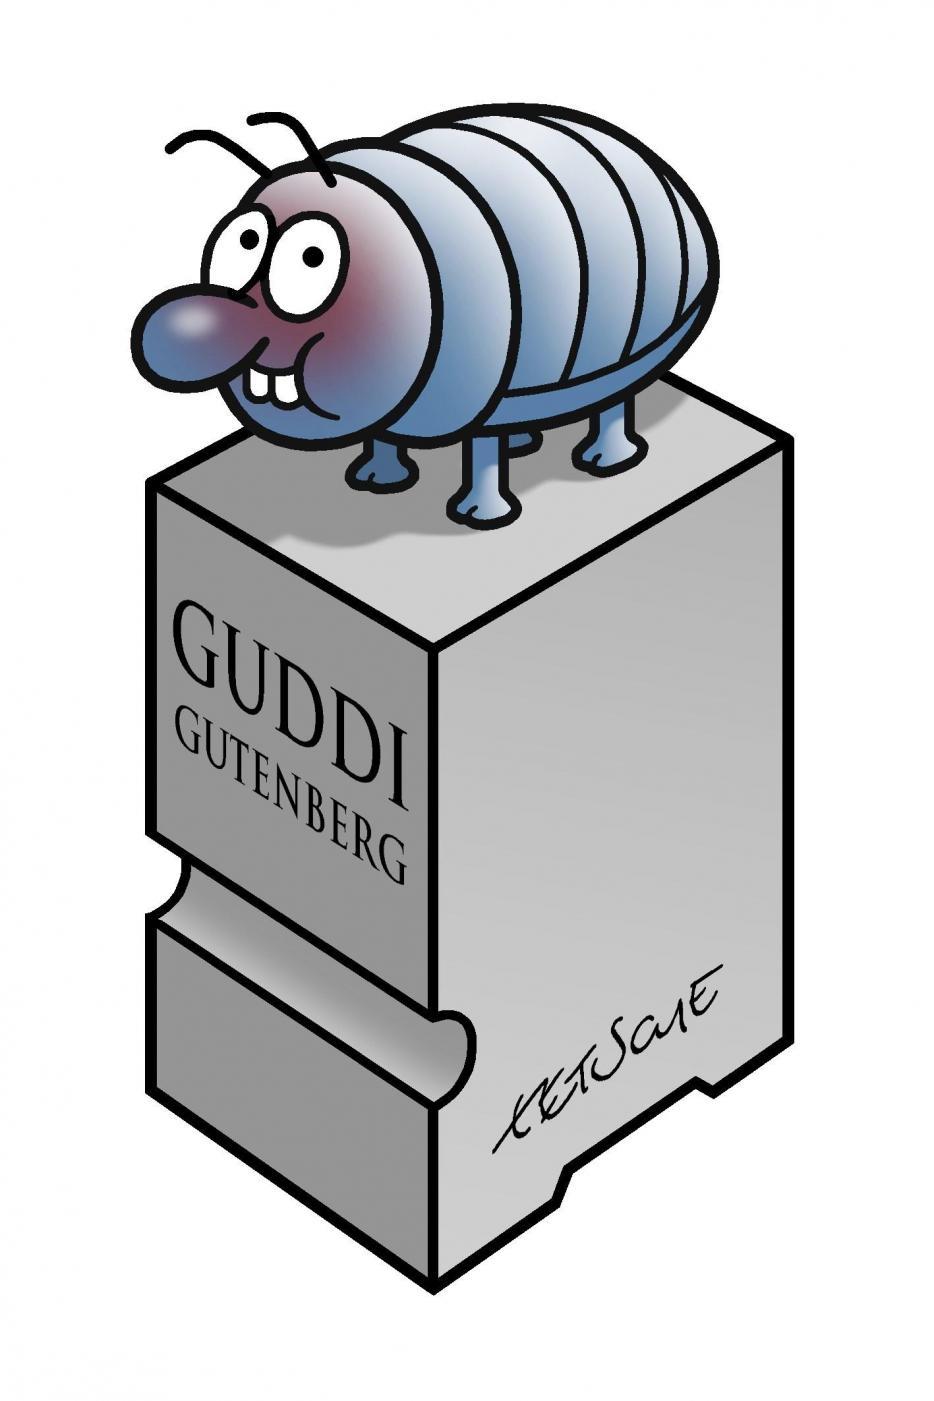 GUDDI GUTENBERG.jpg